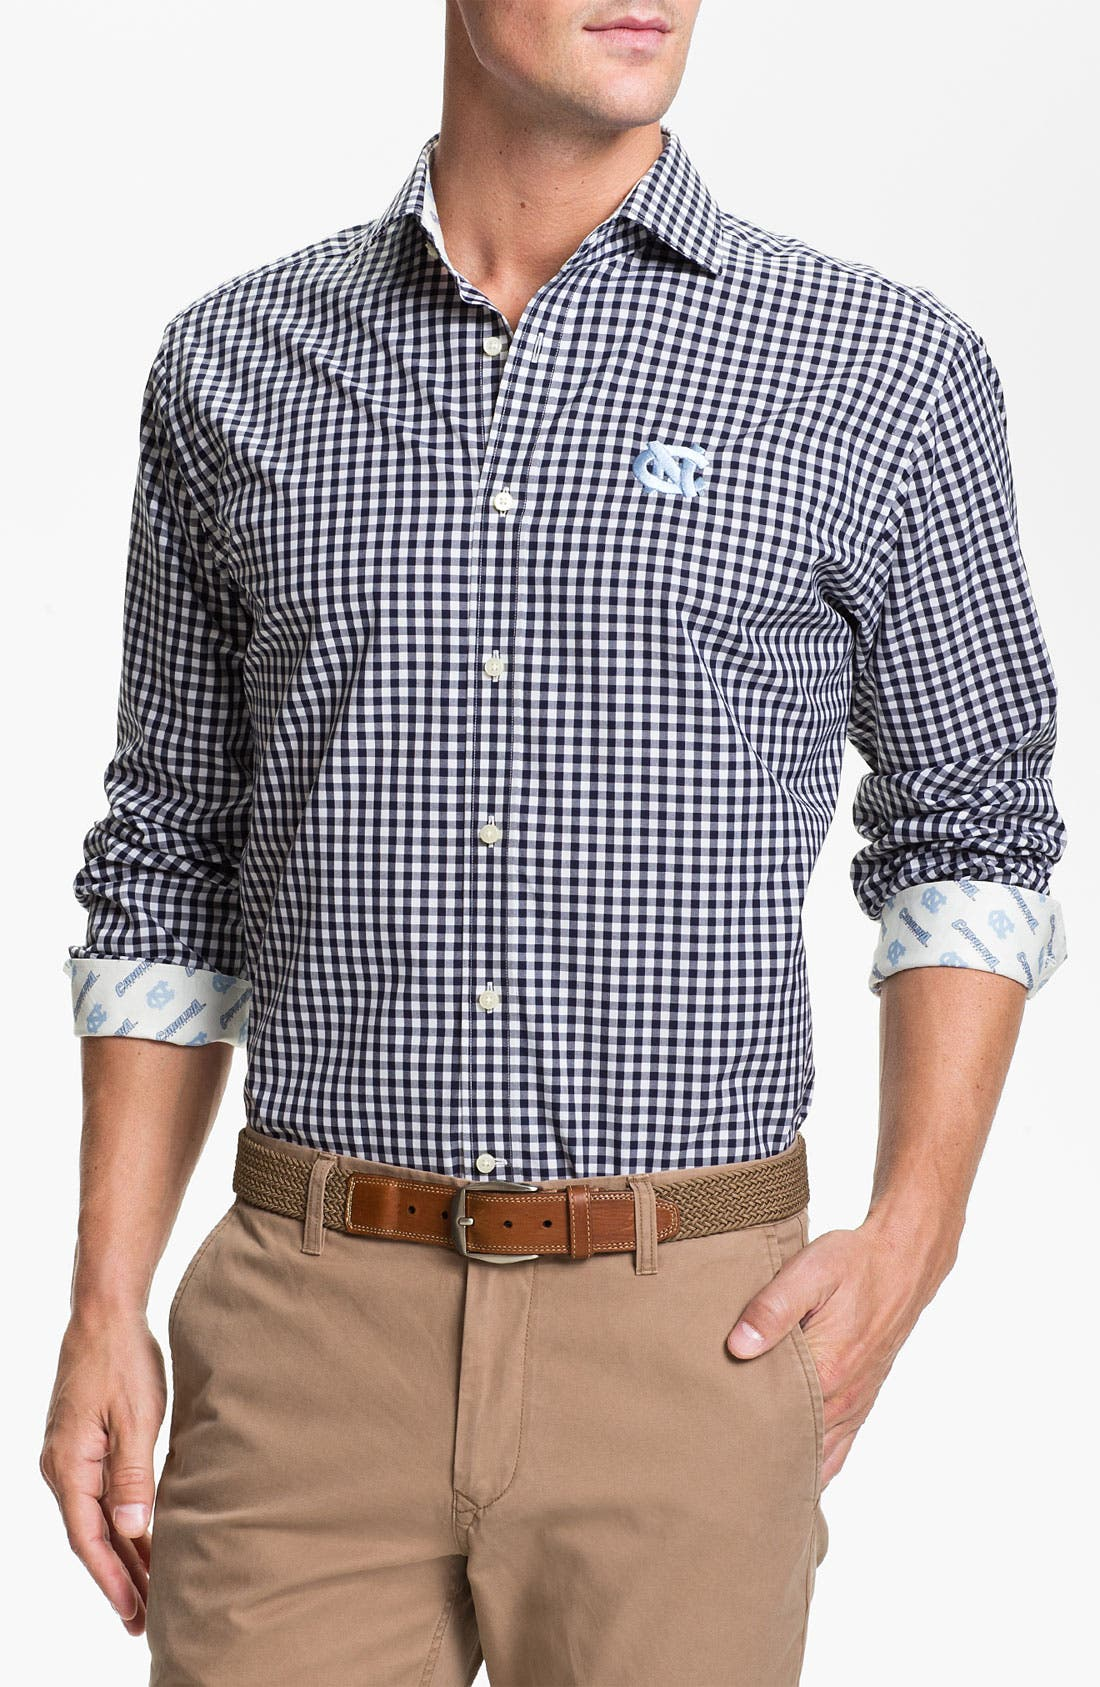 Alternate Image 1 Selected - Thomas Dean 'University of North Carolina' Gingham Sport Shirt